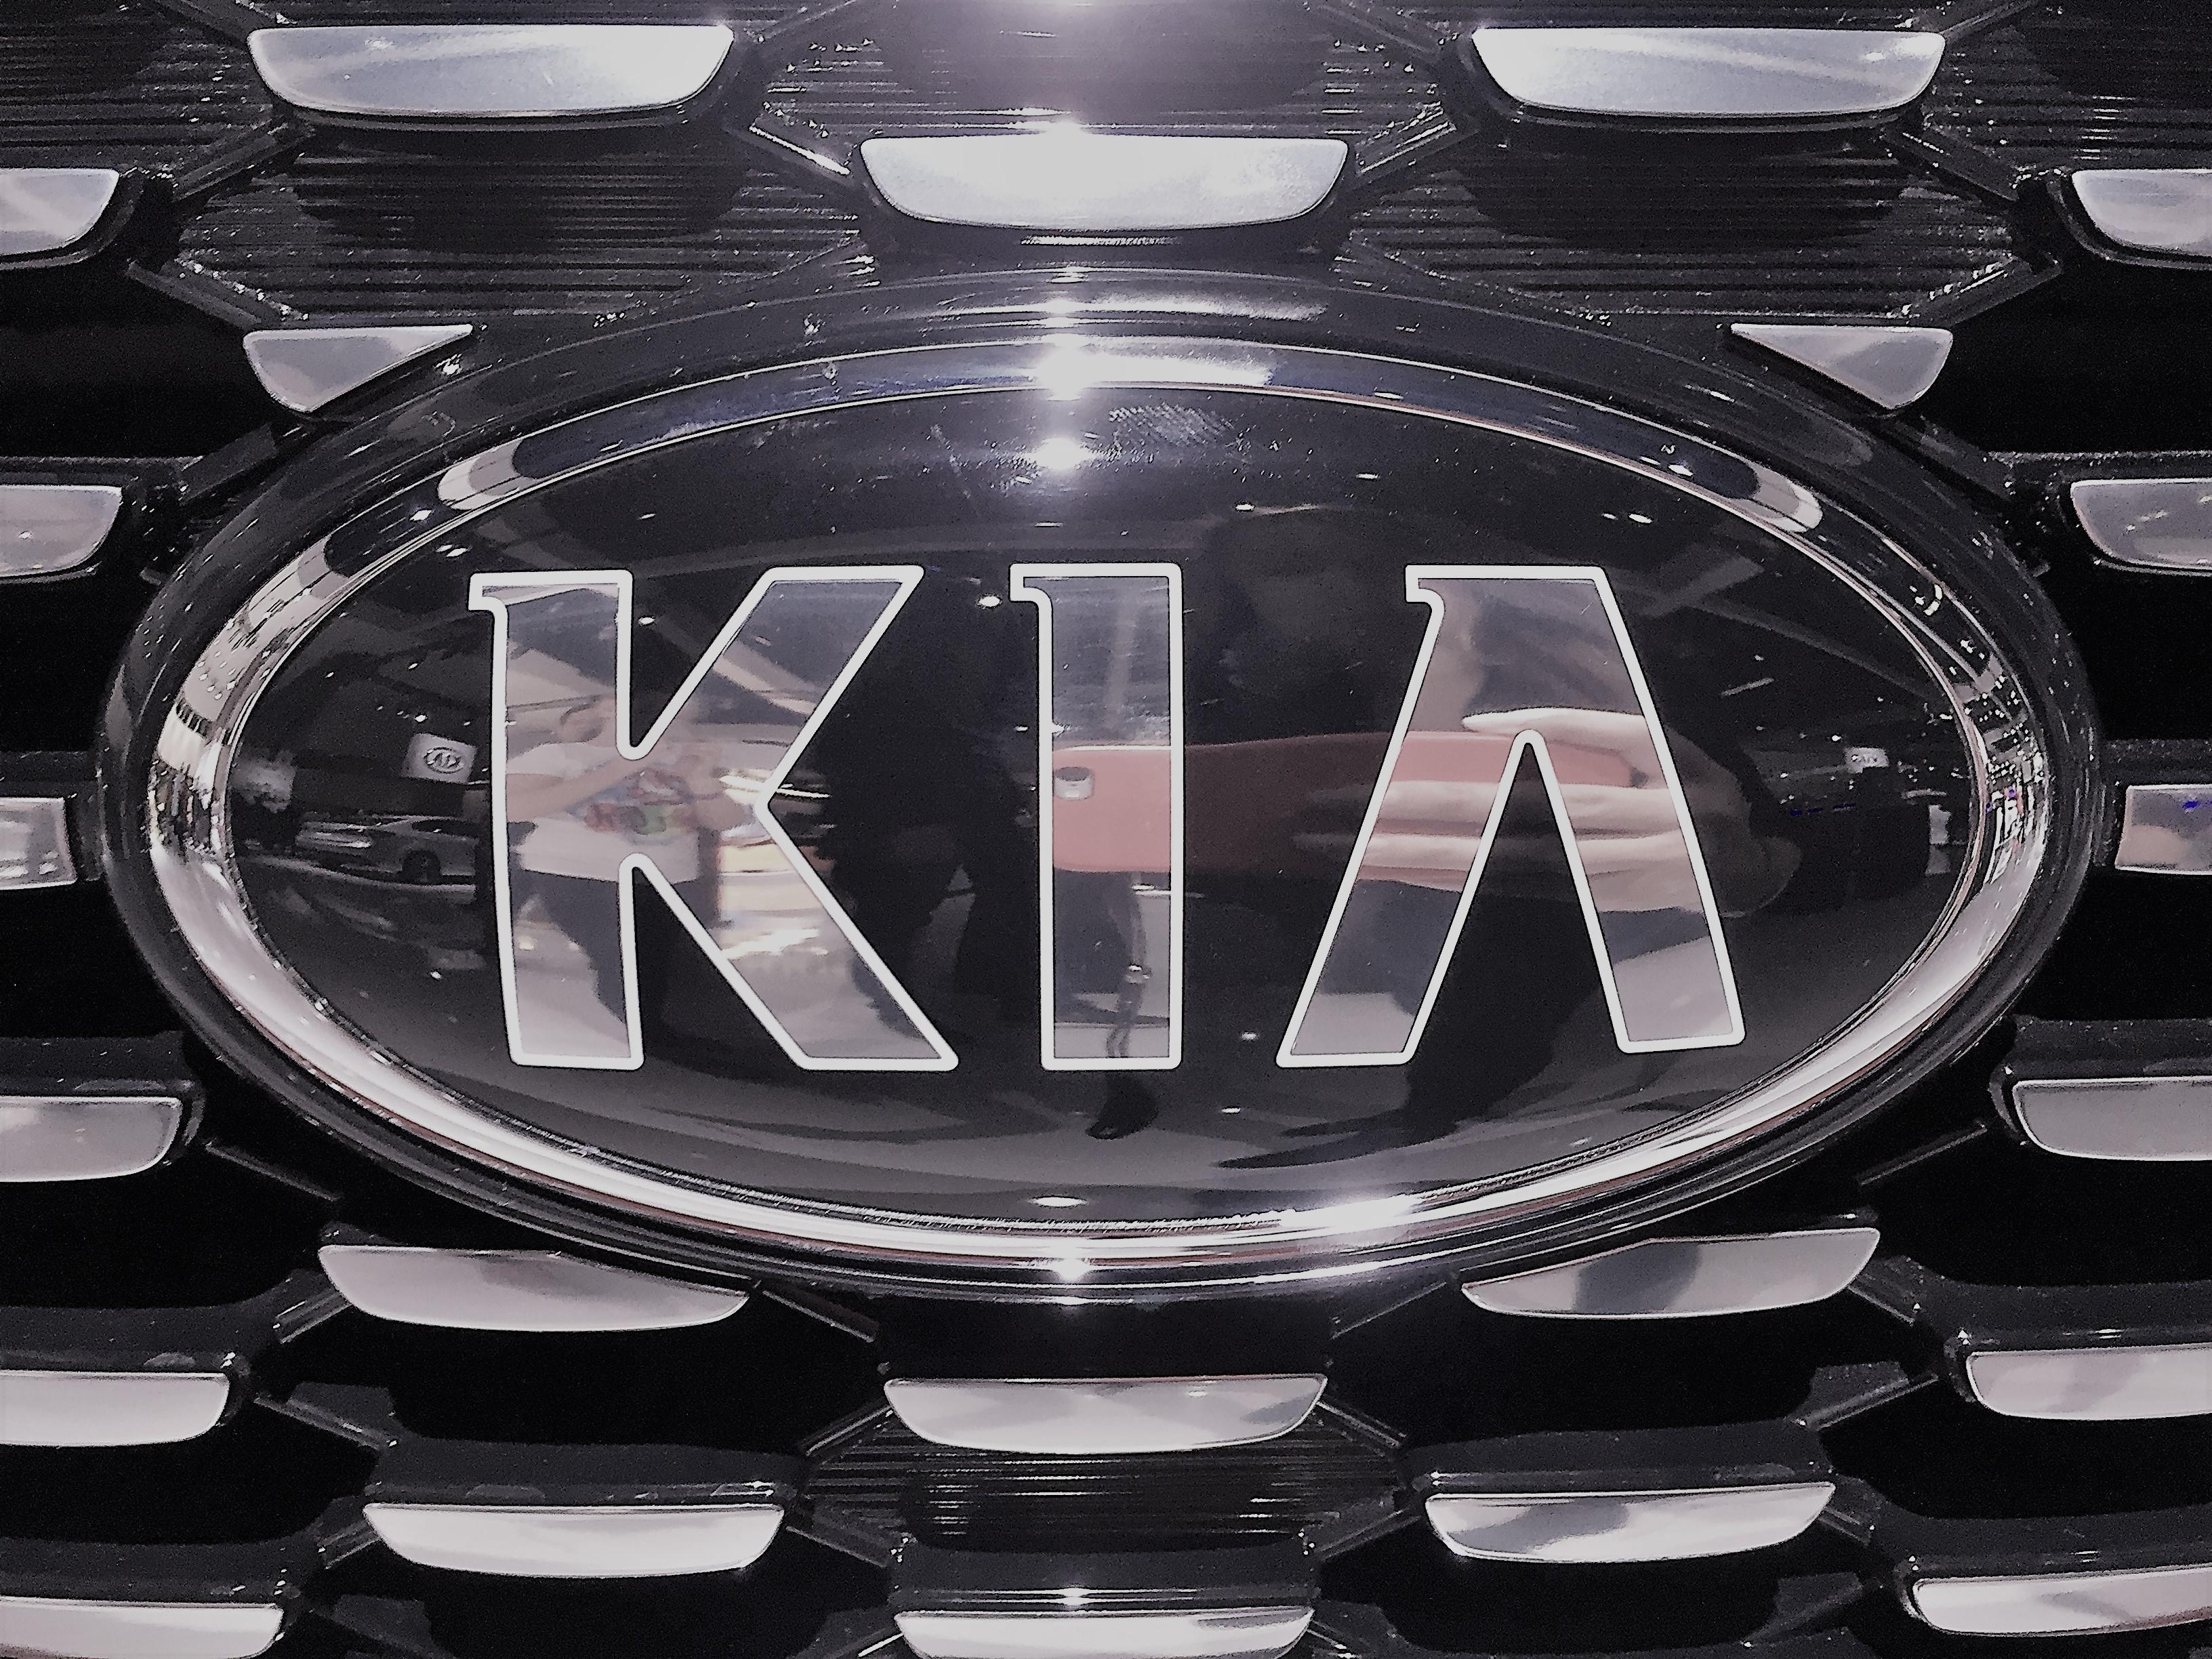 2017 la auto show kia must see cars thats it la la auto show kia biocorpaavc Image collections